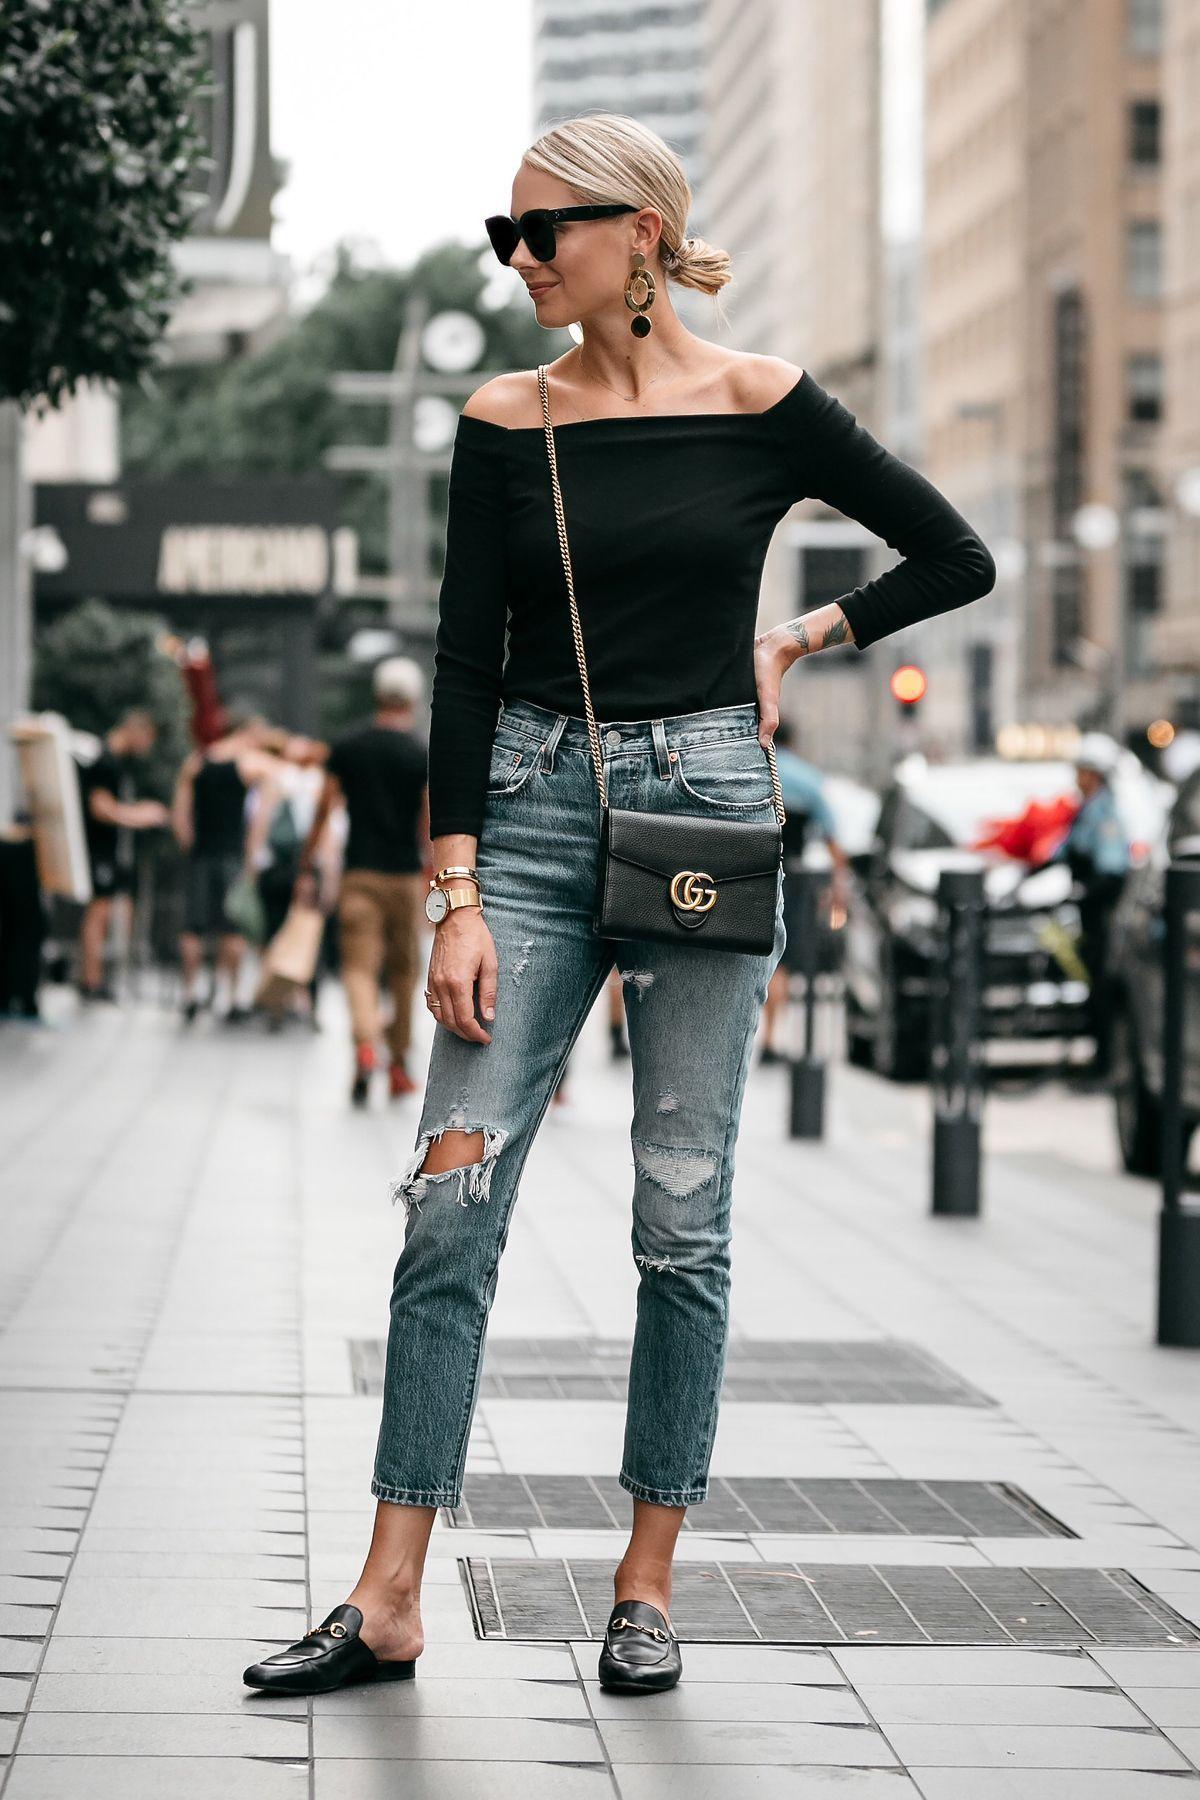 807671d13c2 Blonde Woman Wearing Jcrew black off the shoulder top Levis Denim Ripped Jeans  Gucci Marmont Handbag Gucci Princetown Loafer Mules Fashion Jackson Dallas  ...